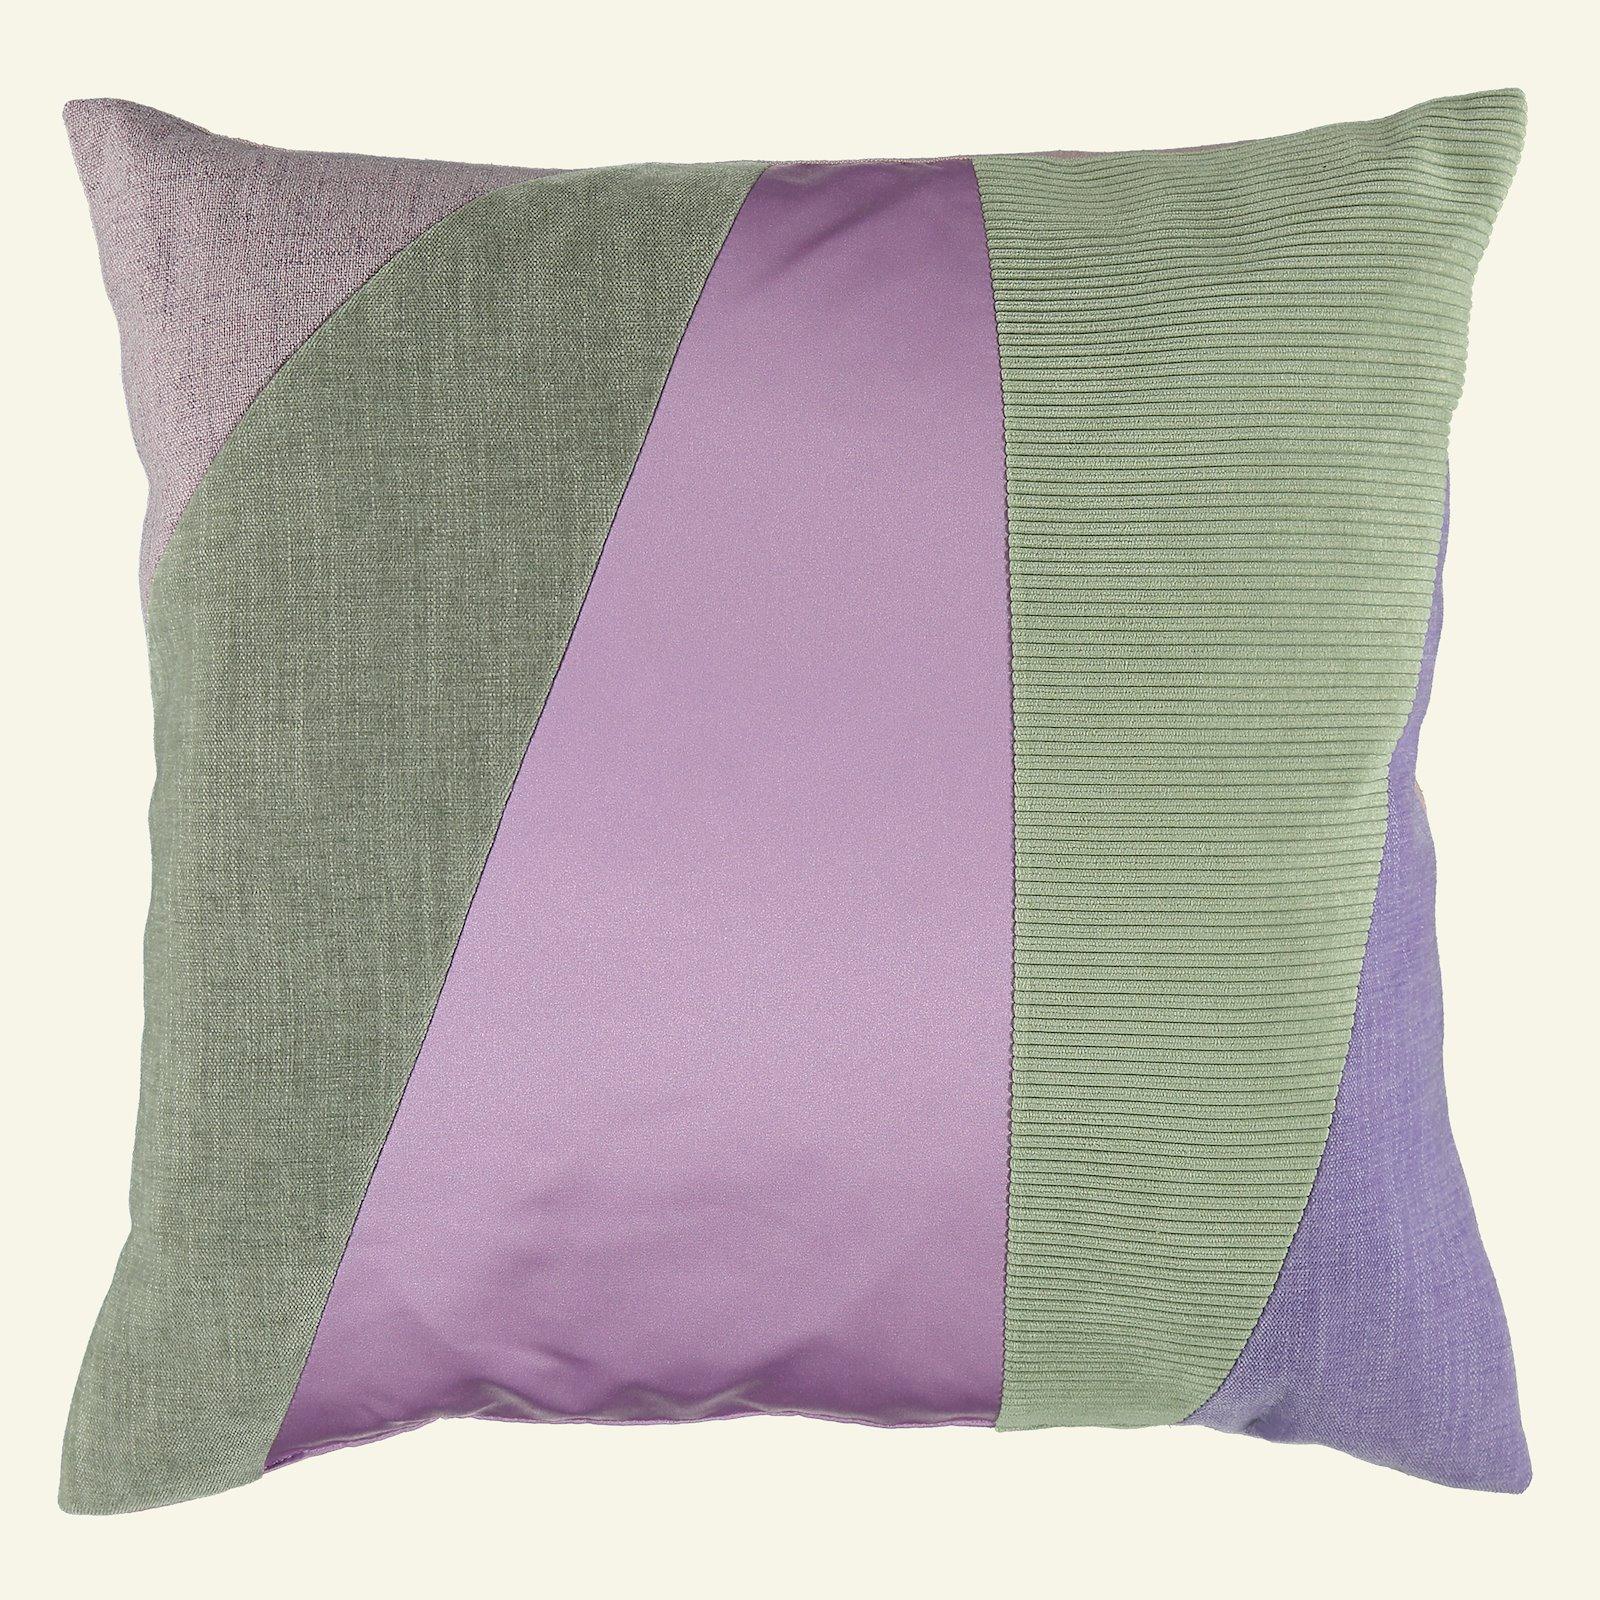 Upholstery corduroy 6 wales light sage 824051_824040_620520_824035_823949_sskit